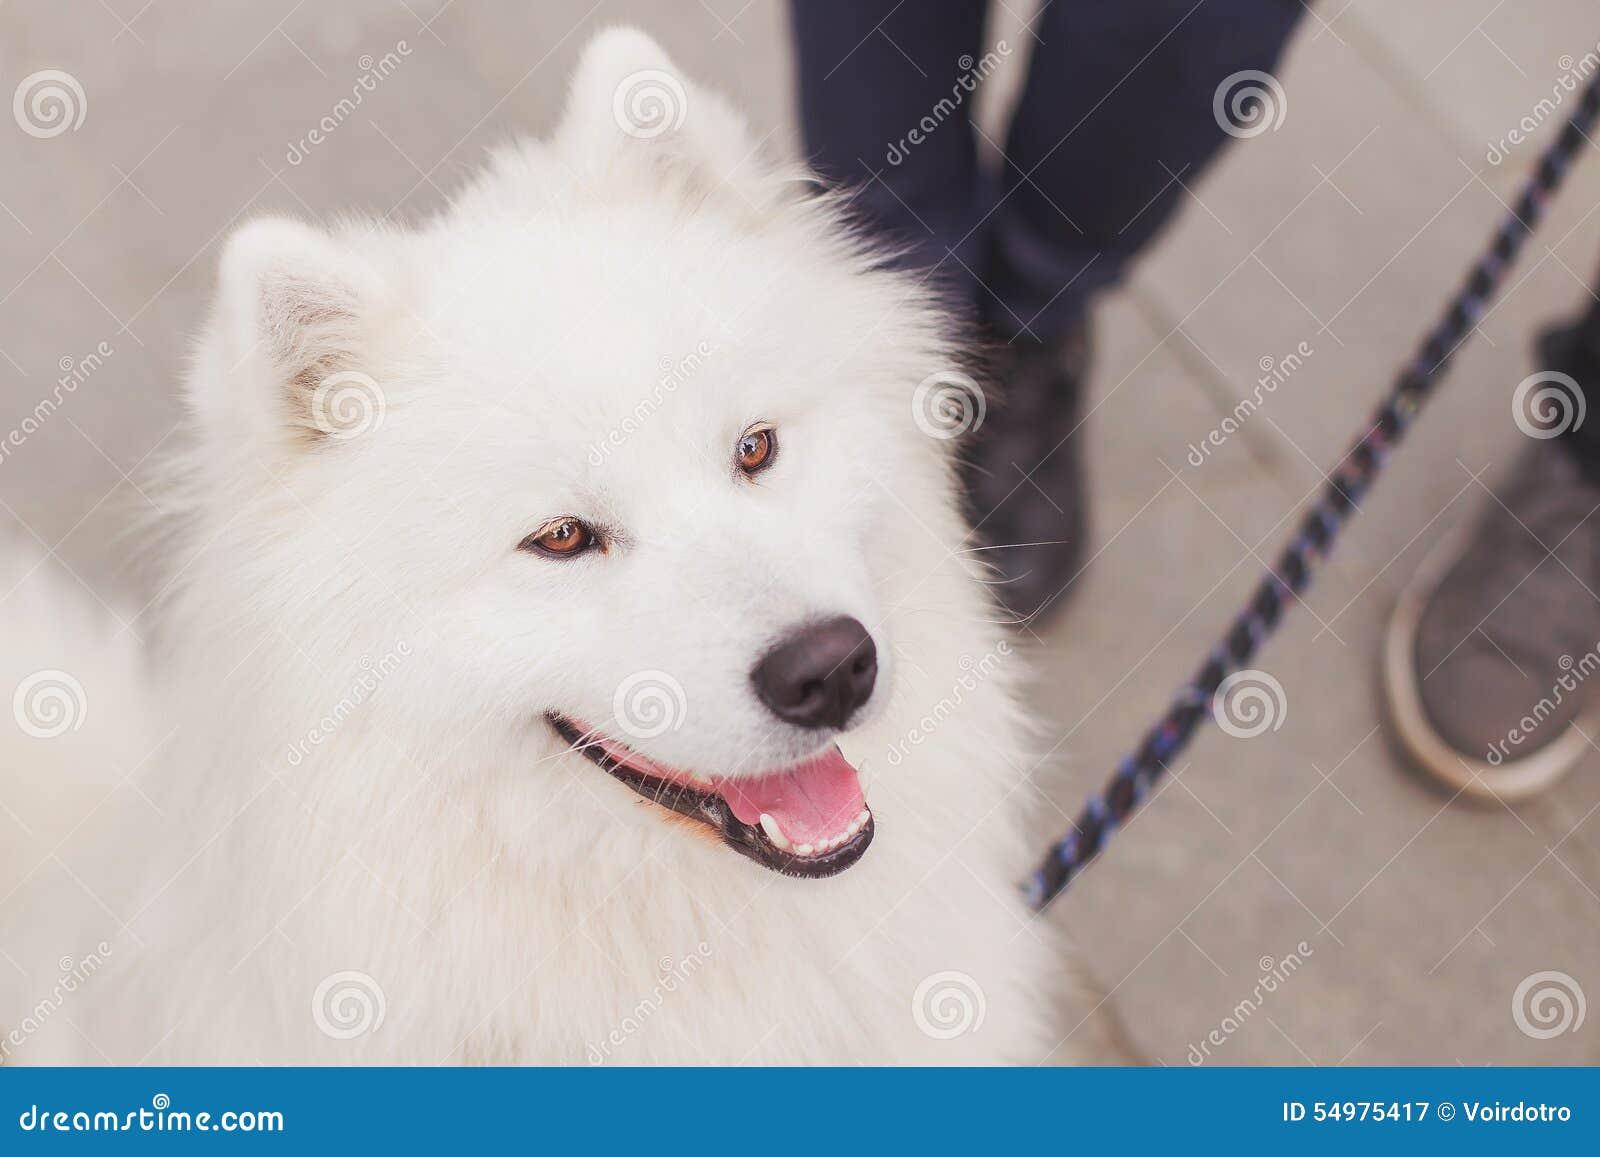 Fluffig vit Samoyedhund med lösning